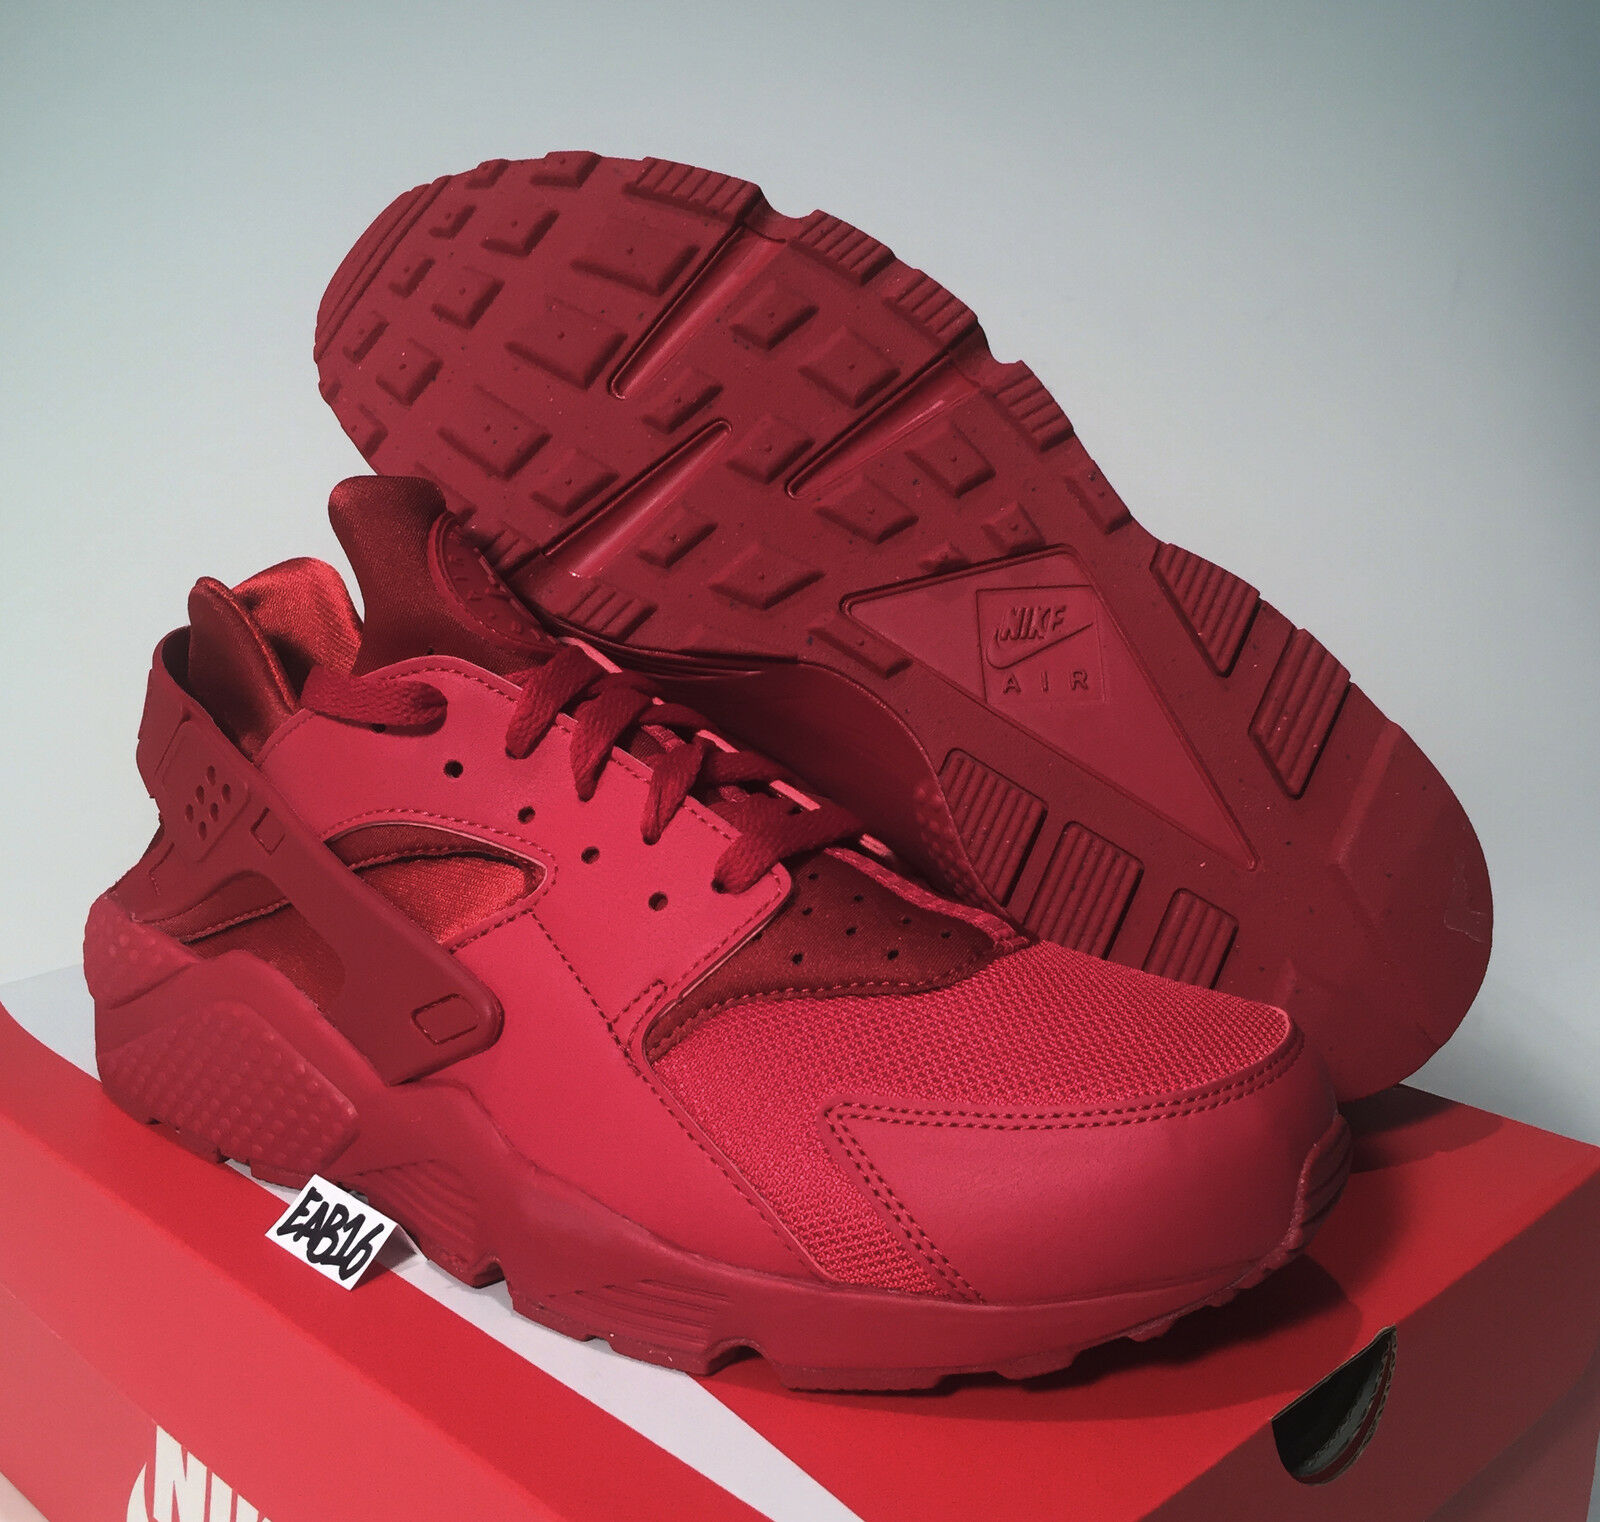 Nike Air Huarache Run Triple All Varsity Red 318429 660 Size 9-12 Mono October